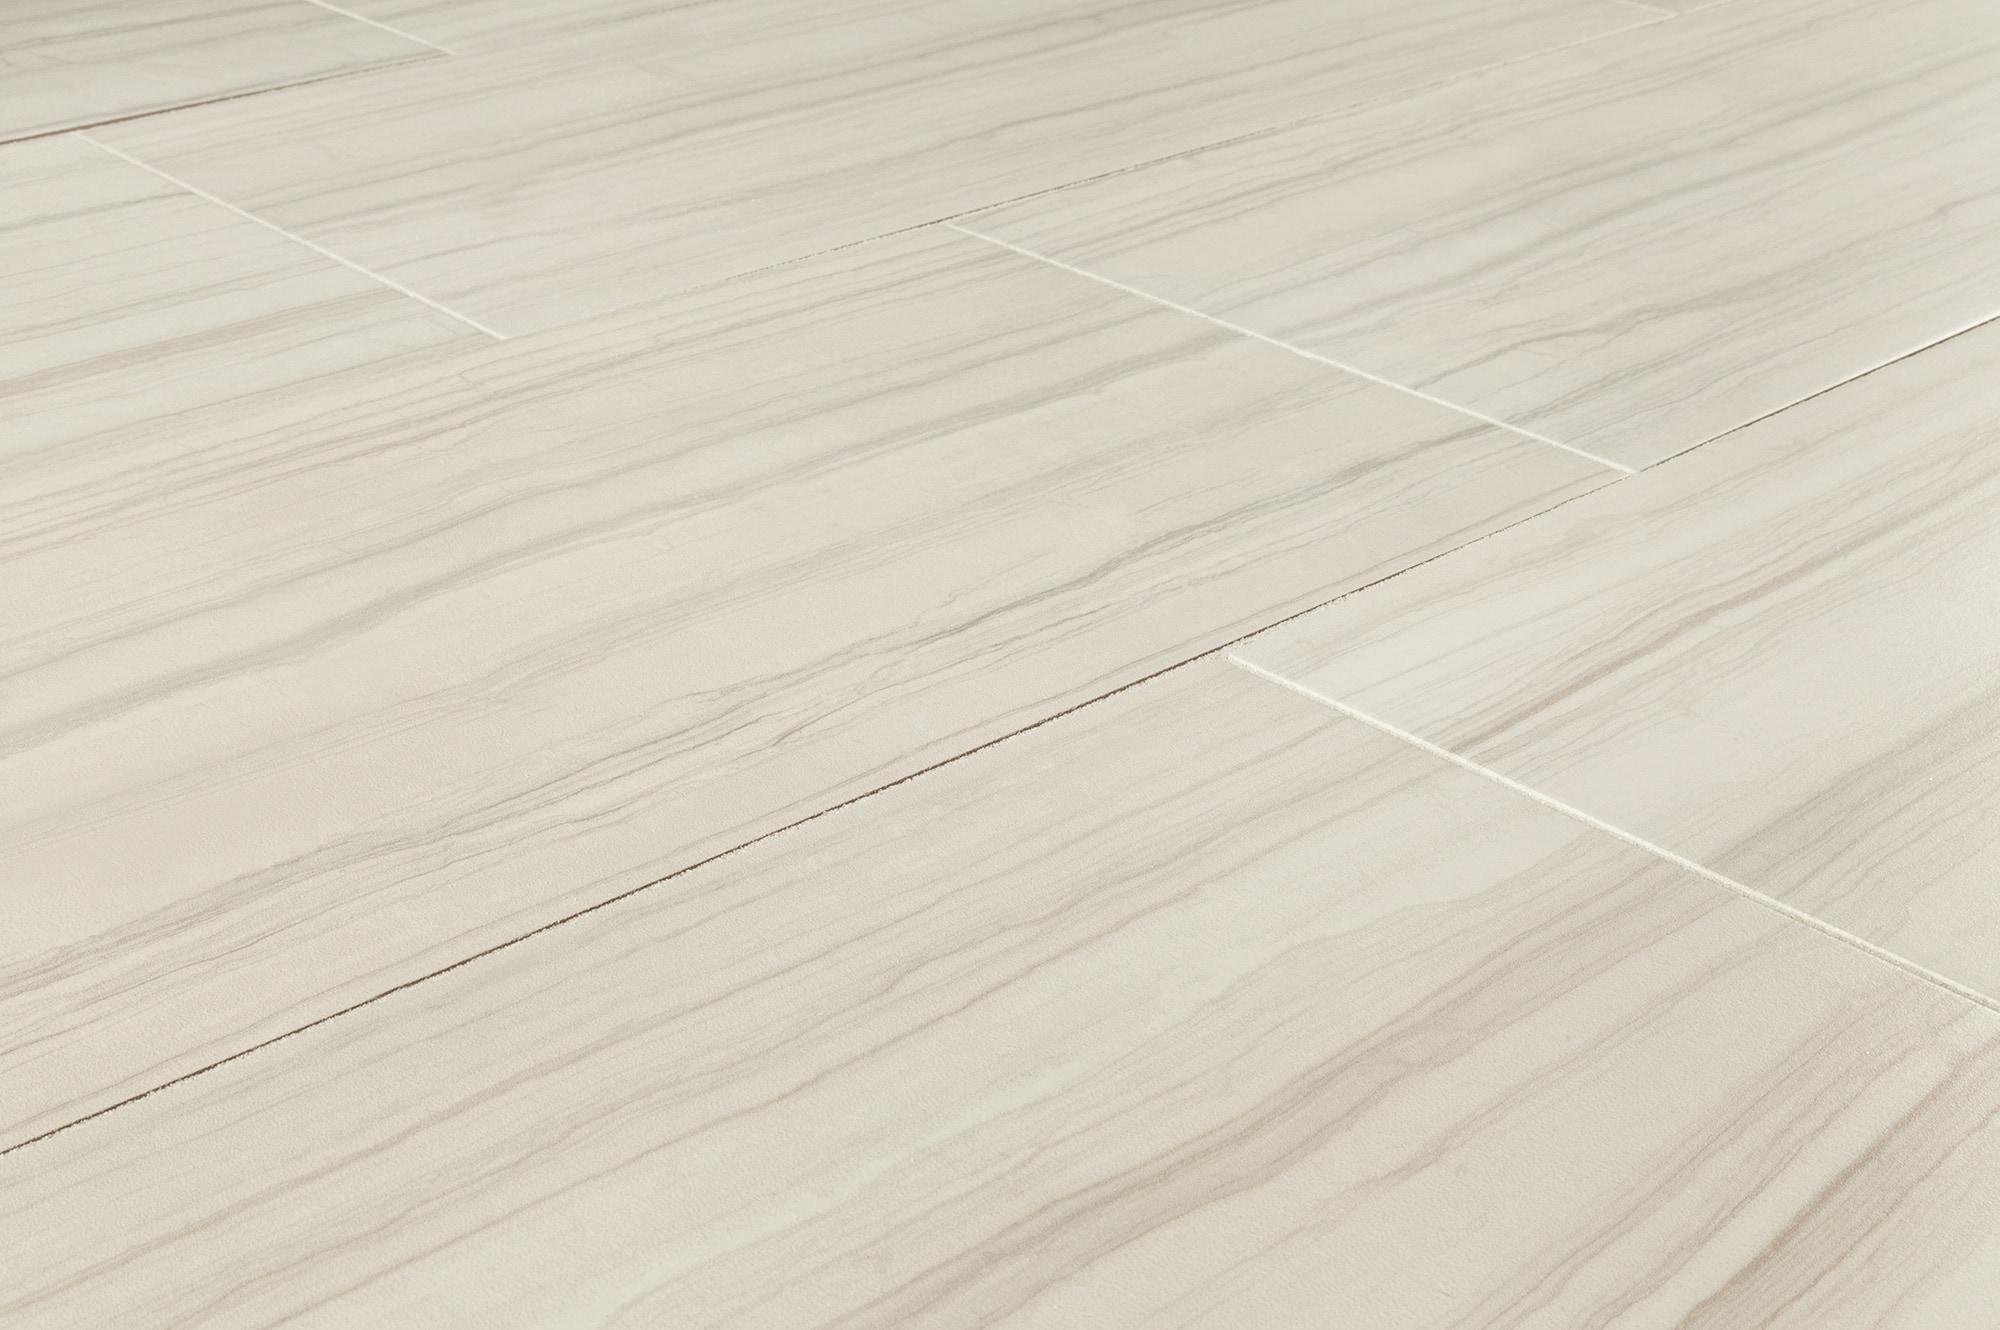 Flooring Tile Flooring Ceramic Porcelain Tile All Products White